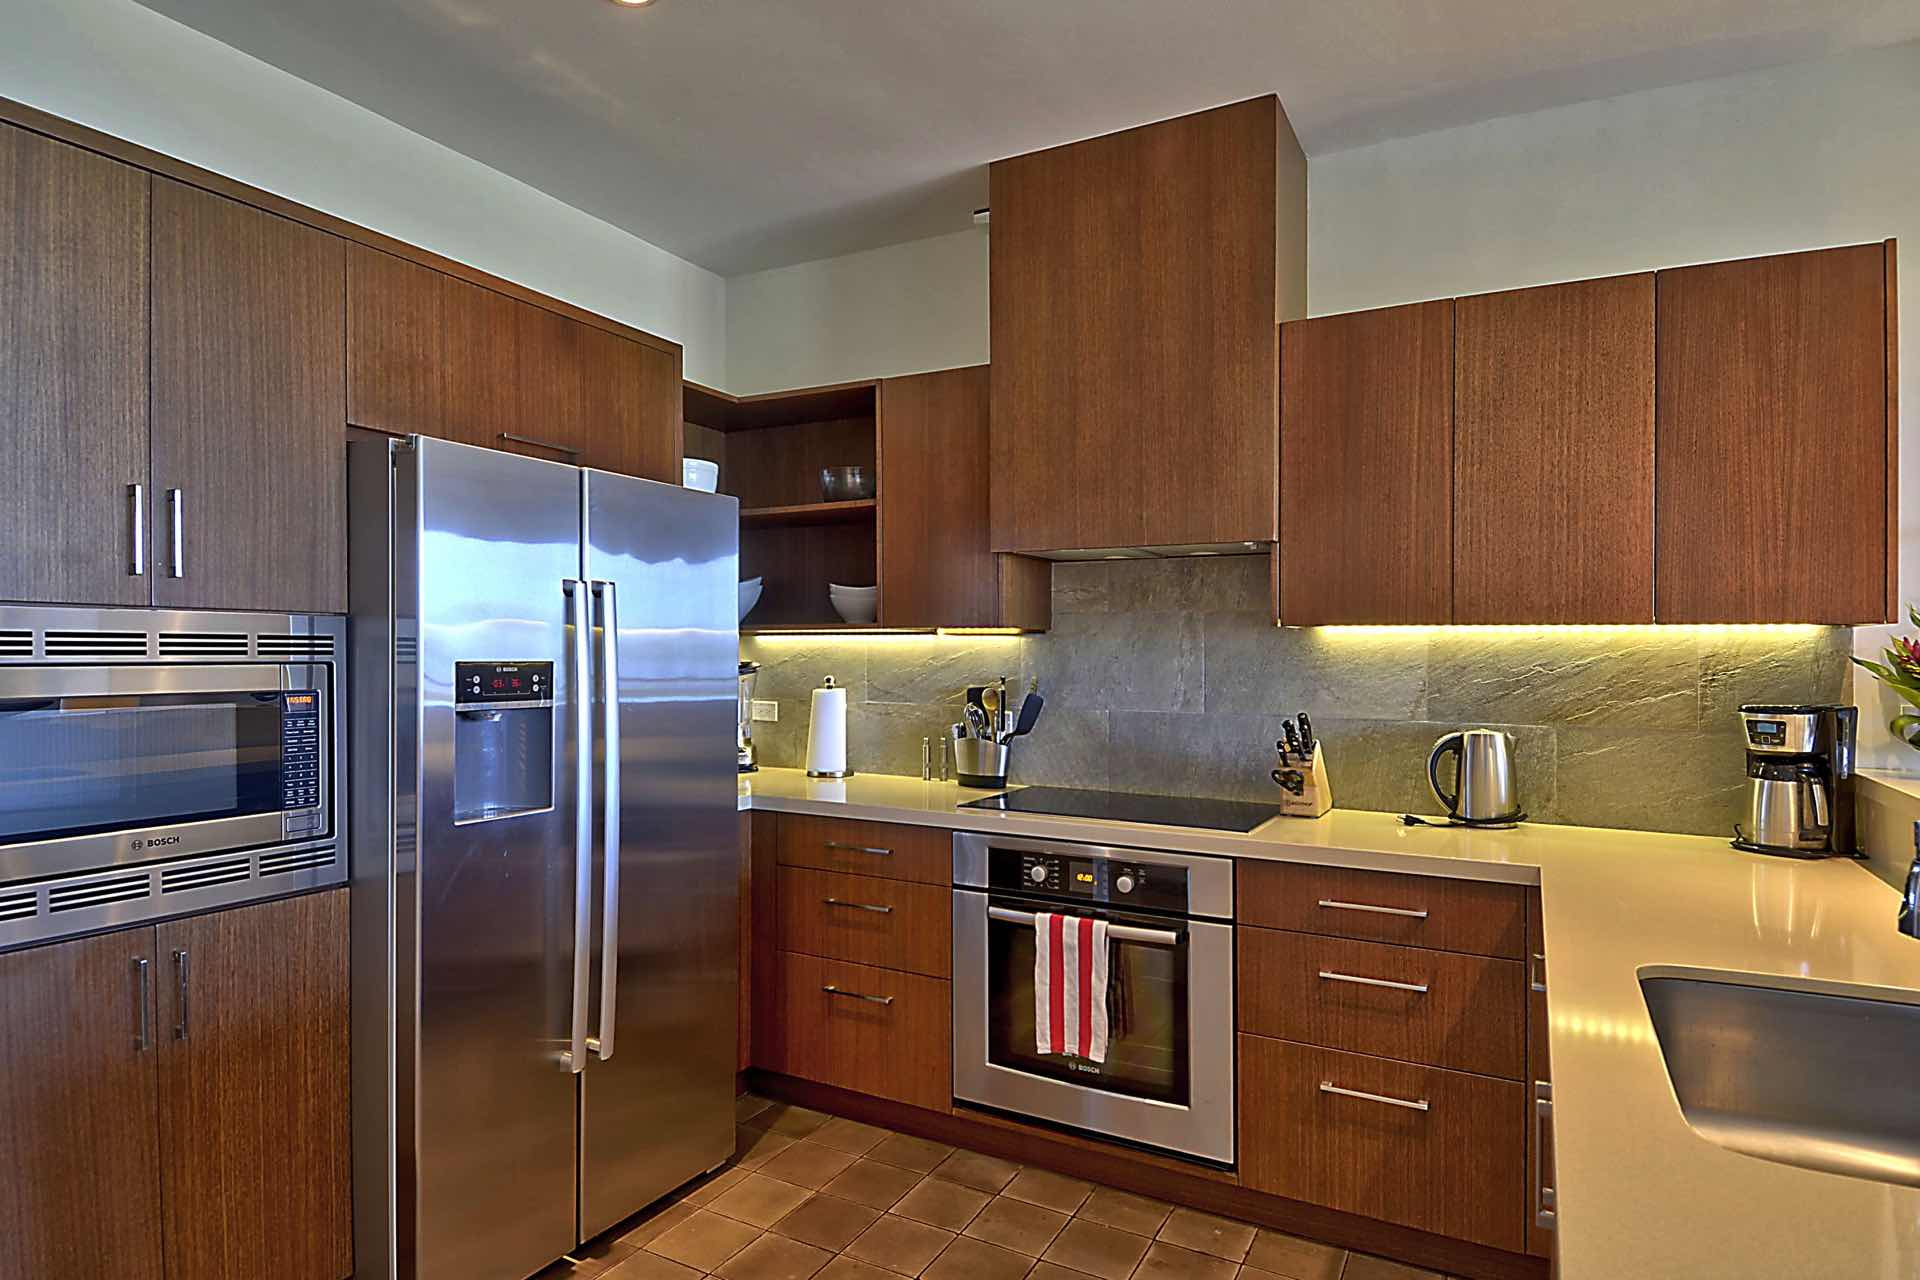 Kitchen features Bosch appliances